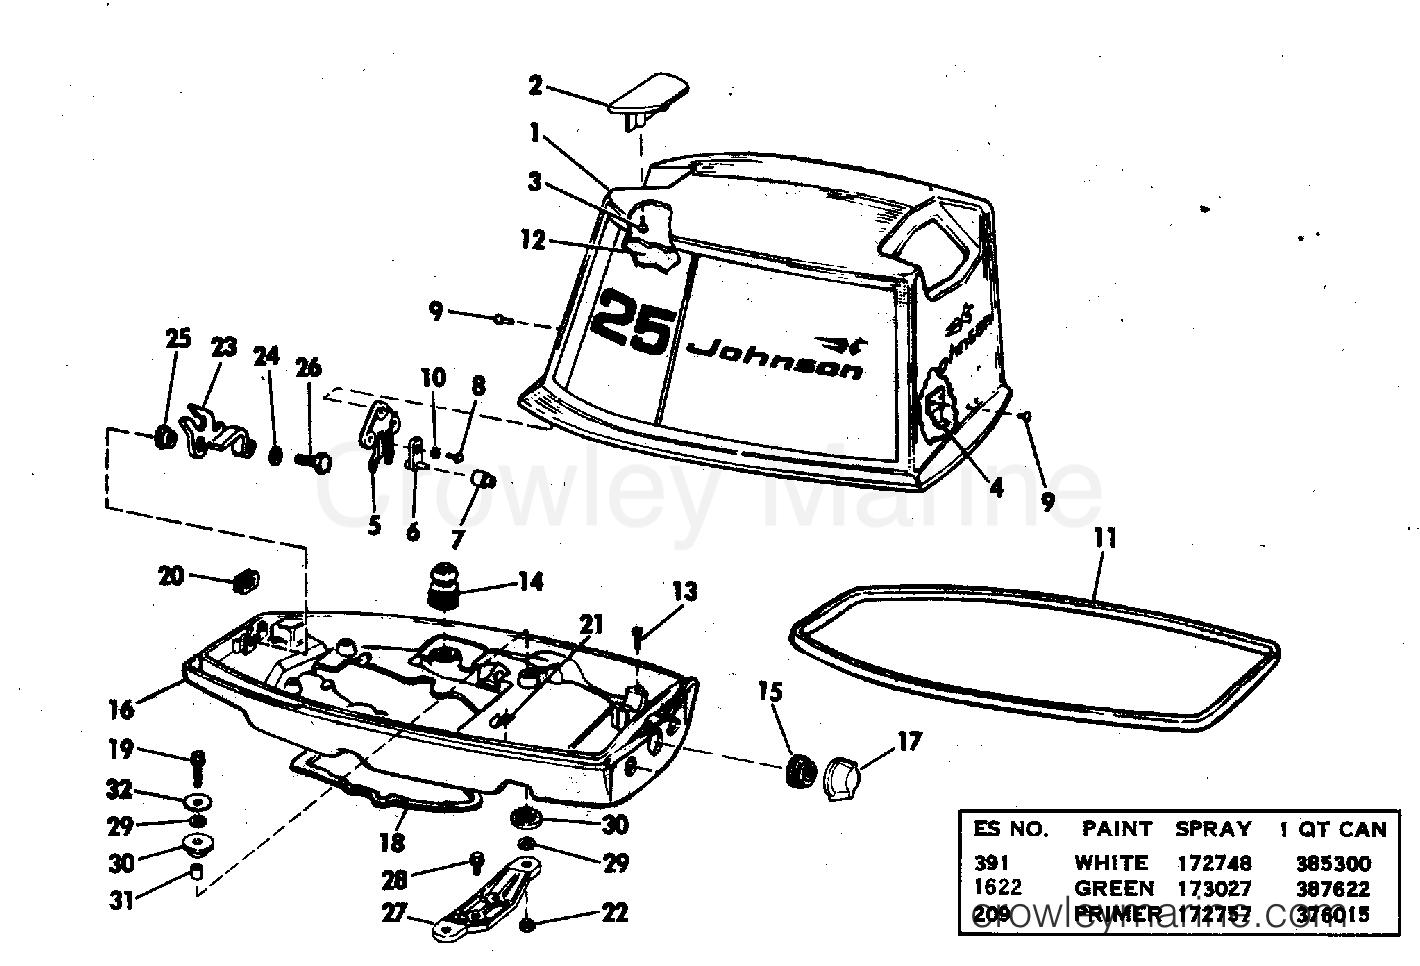 tags: #25 hp johnson outboard diagram#1970 25 hp johnson outboard#1996  johnson 25 hp outboard#evinrude 25 hp outboard motor#25 hp johnson outboard  motor